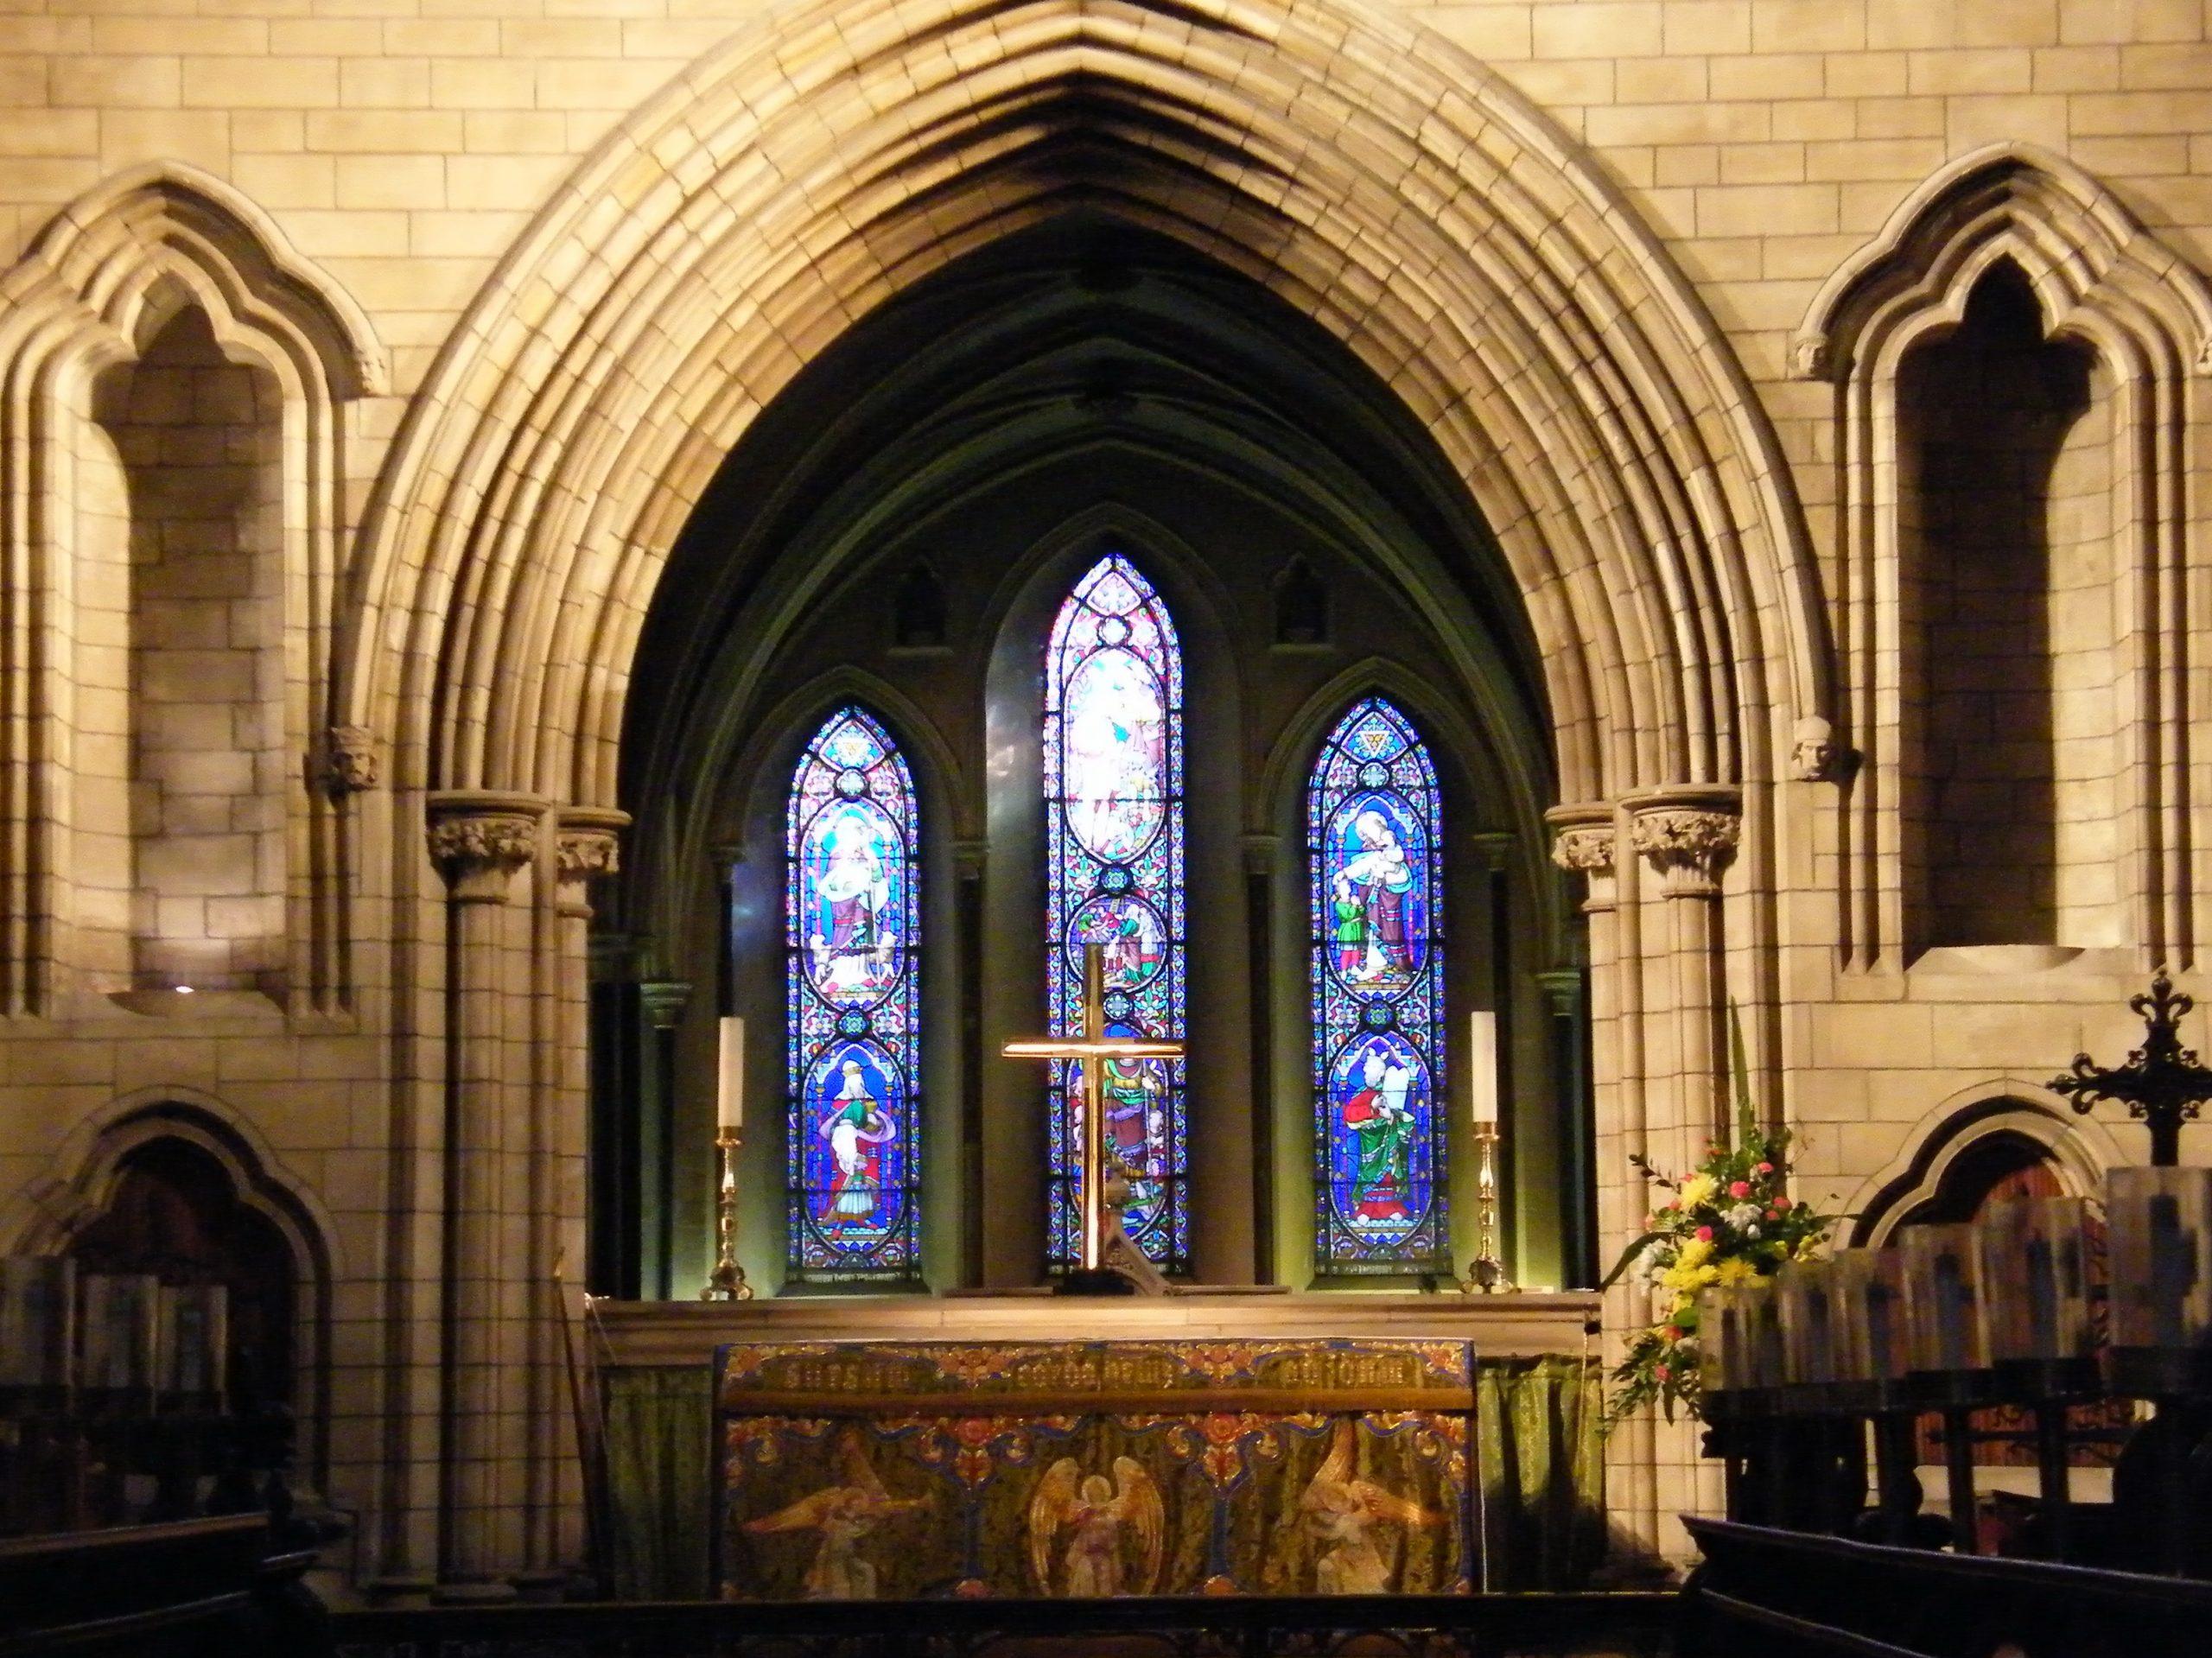 Saint_Patrick's_Cathedral,_Dublin,_altar